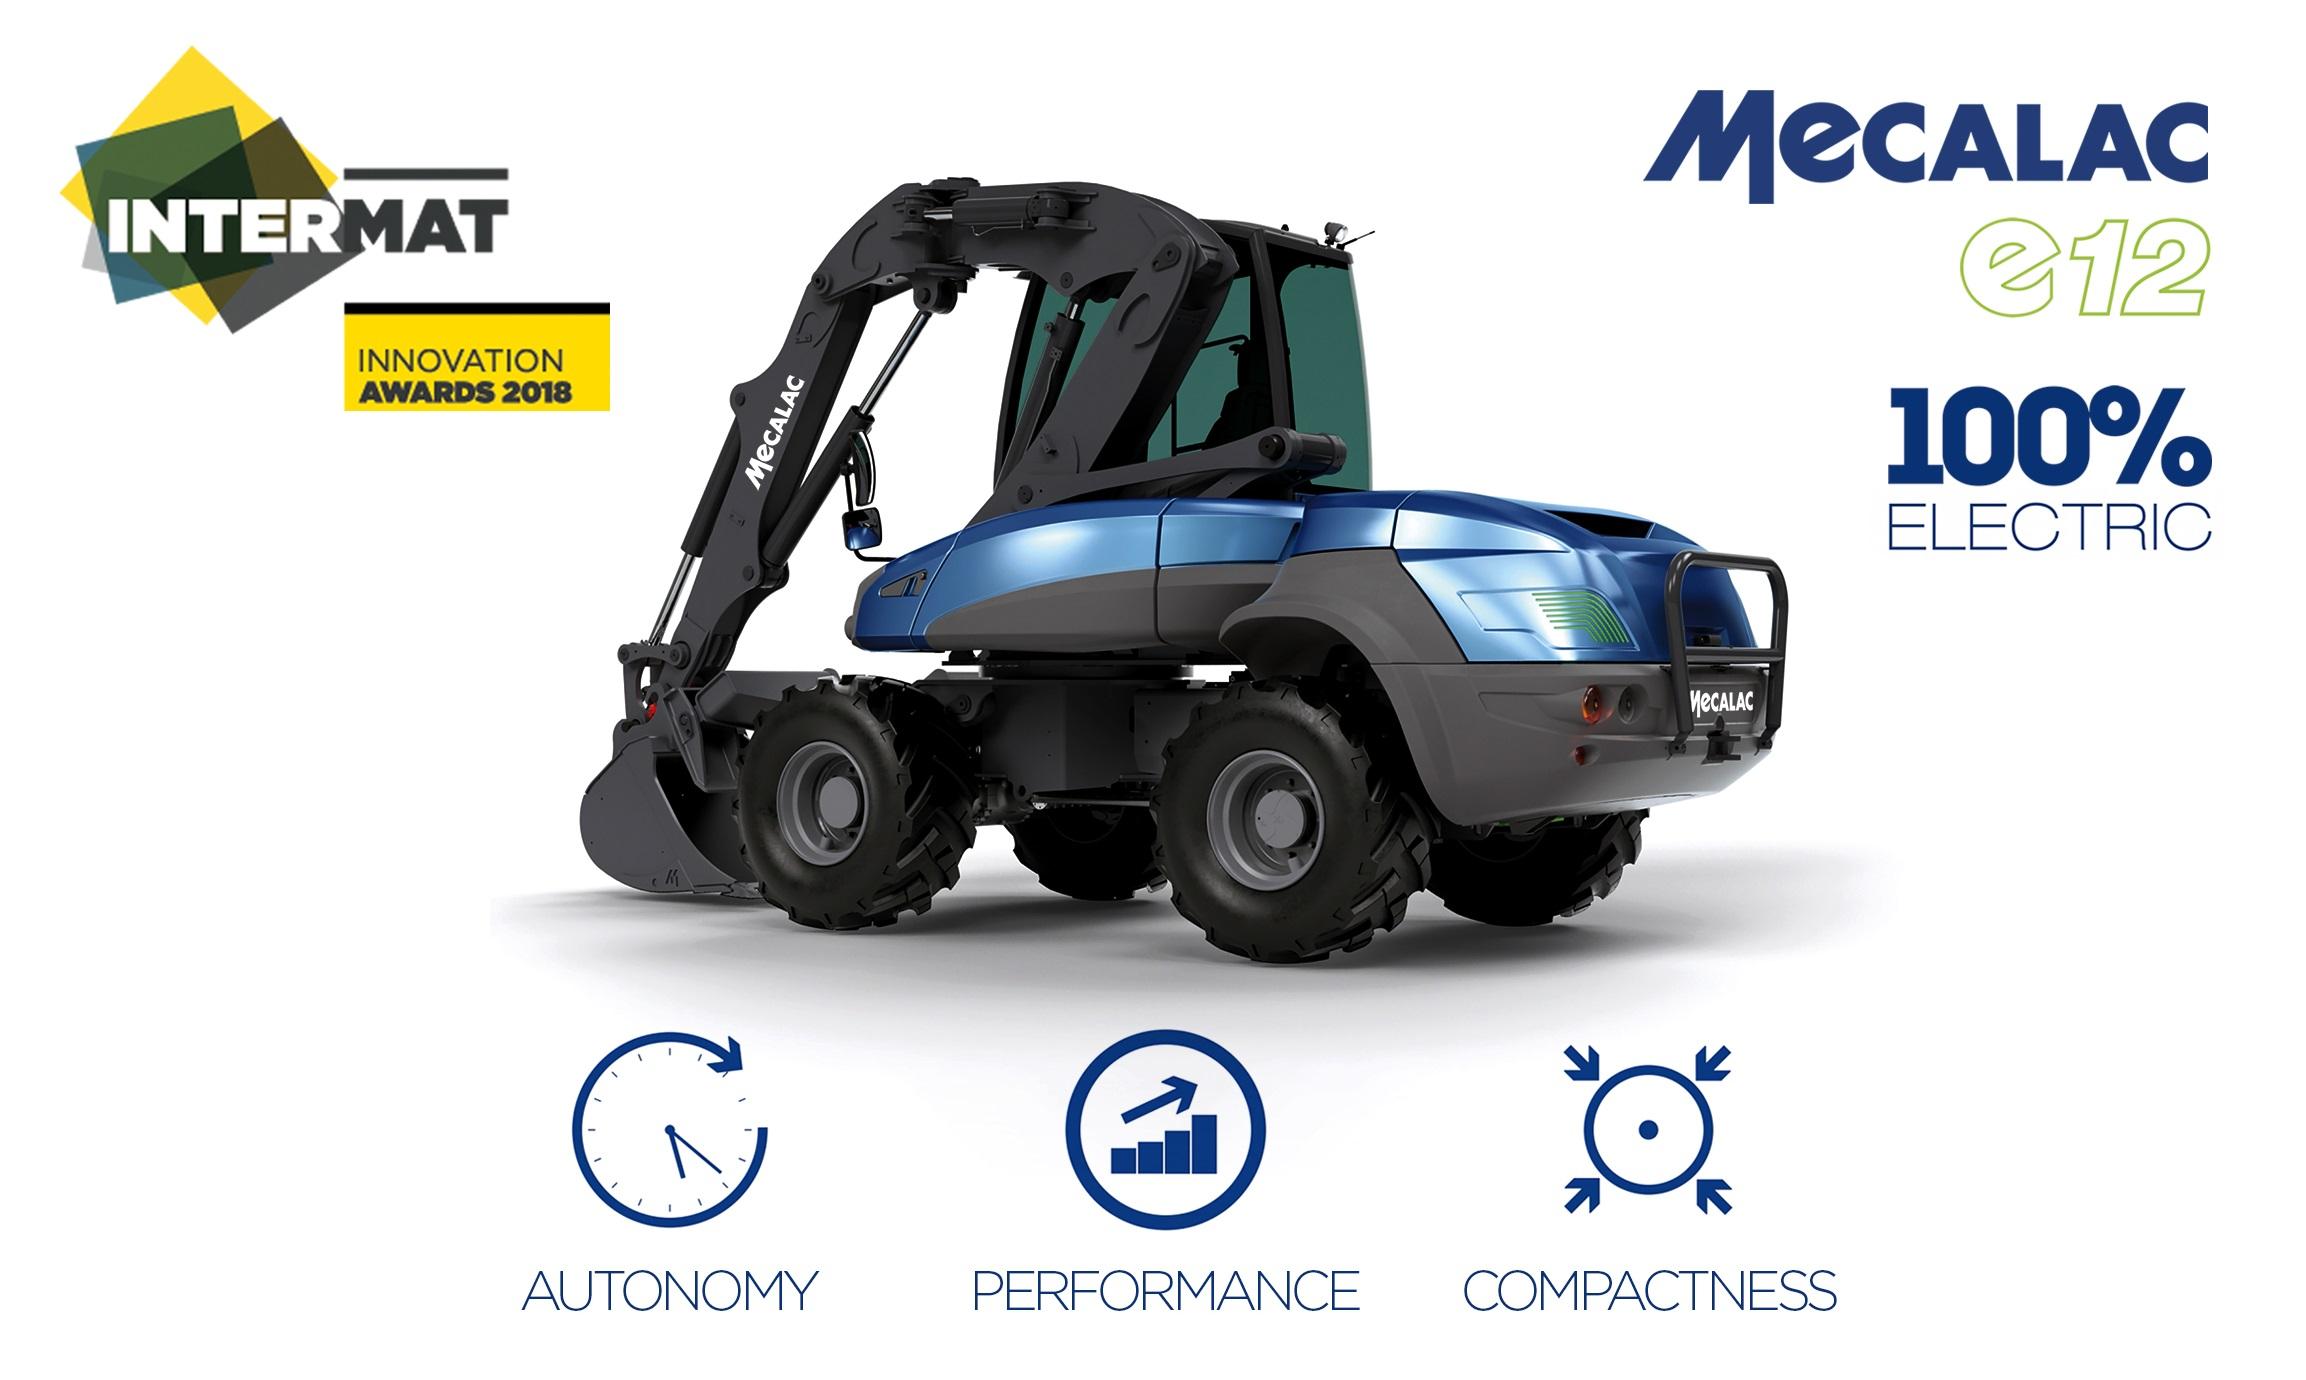 MECALAC e12: a 100%-electric excavator